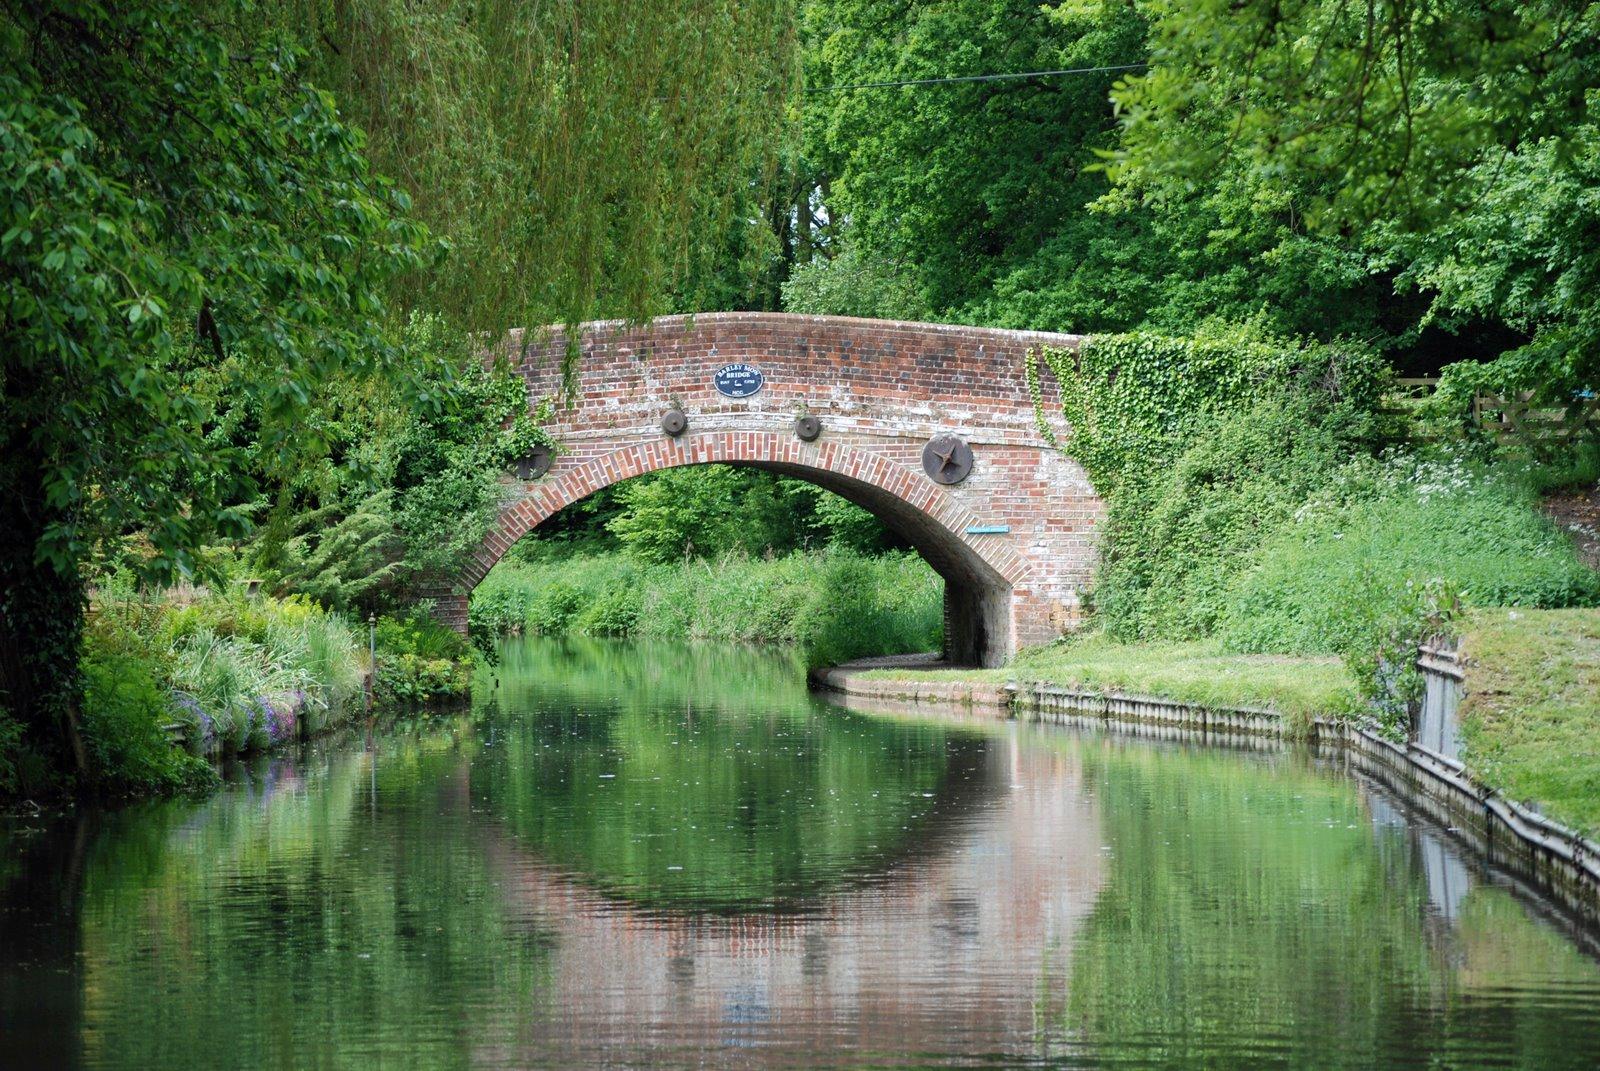 barley mow bridge, basingstoke canal, hampshire